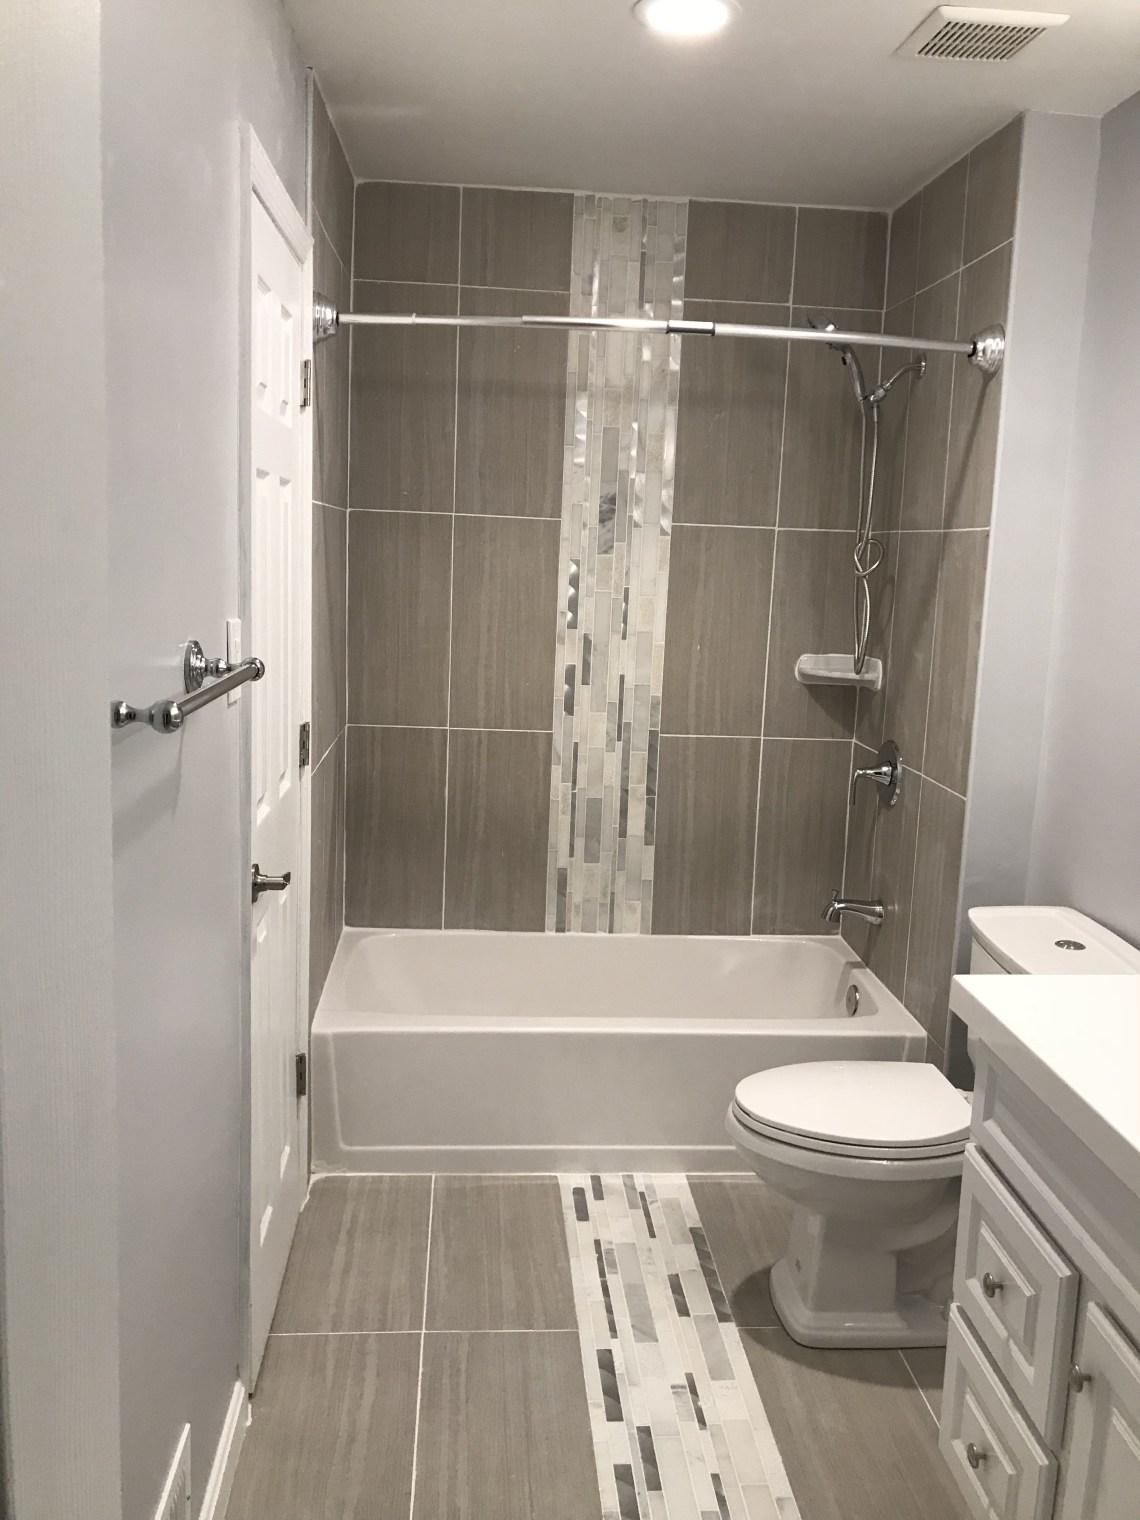 My Finished Bathroom Bathroom Remodel Shower Bathrooms Remodel